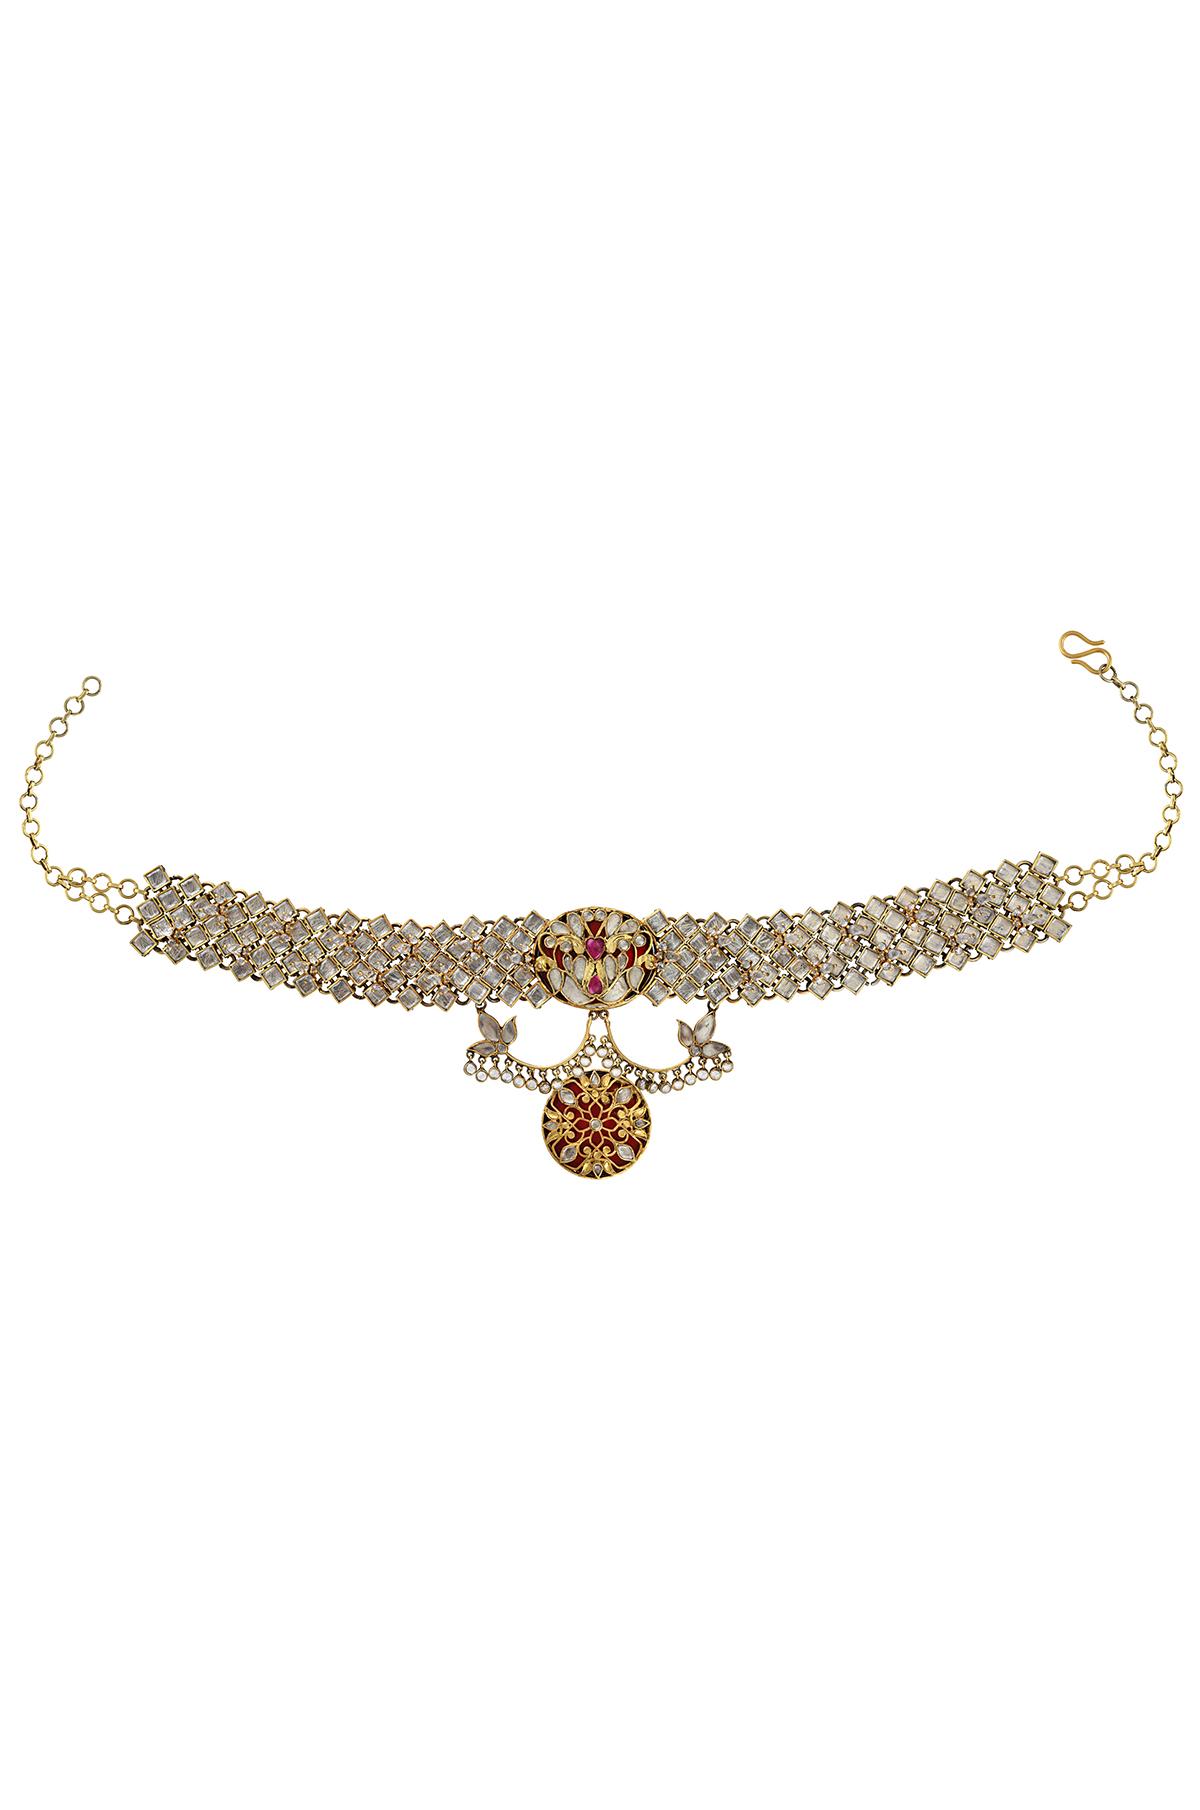 Silver Gold Plated Atulya Lotus Peacock Interlinked Rhombus Choker